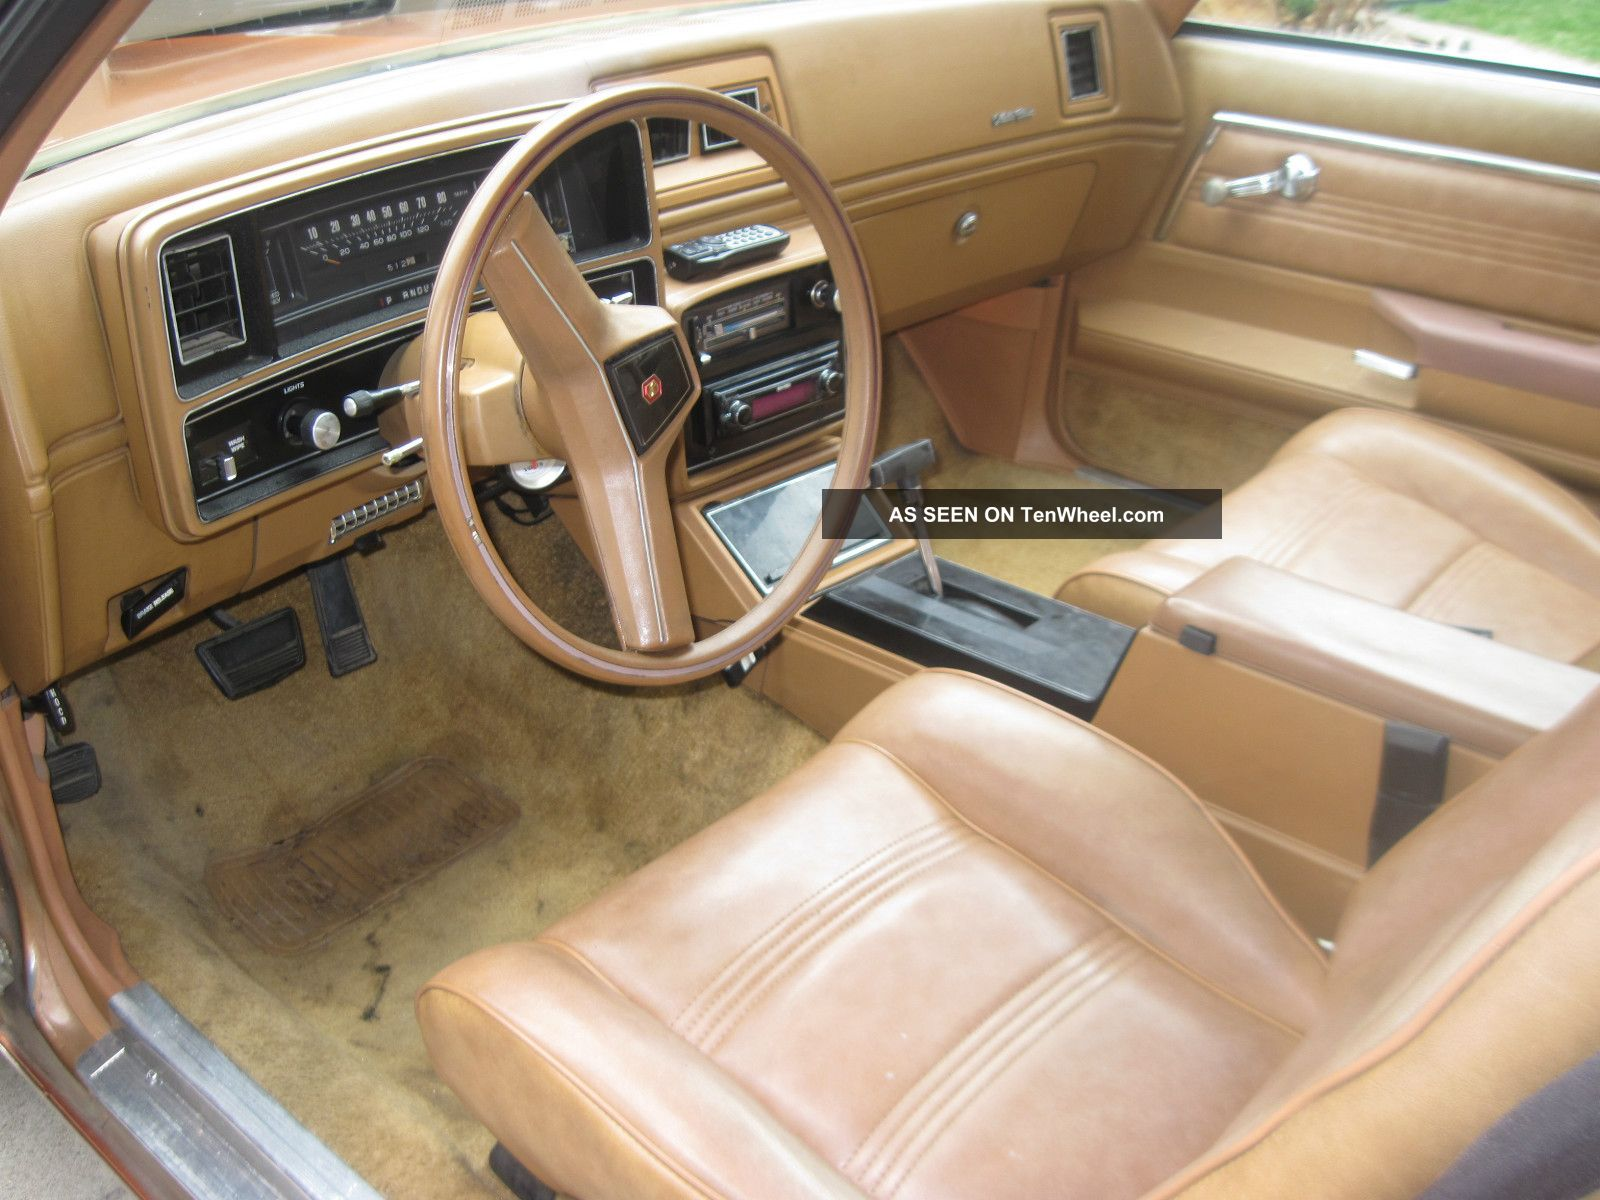 2012 Chevy Malibu Interior